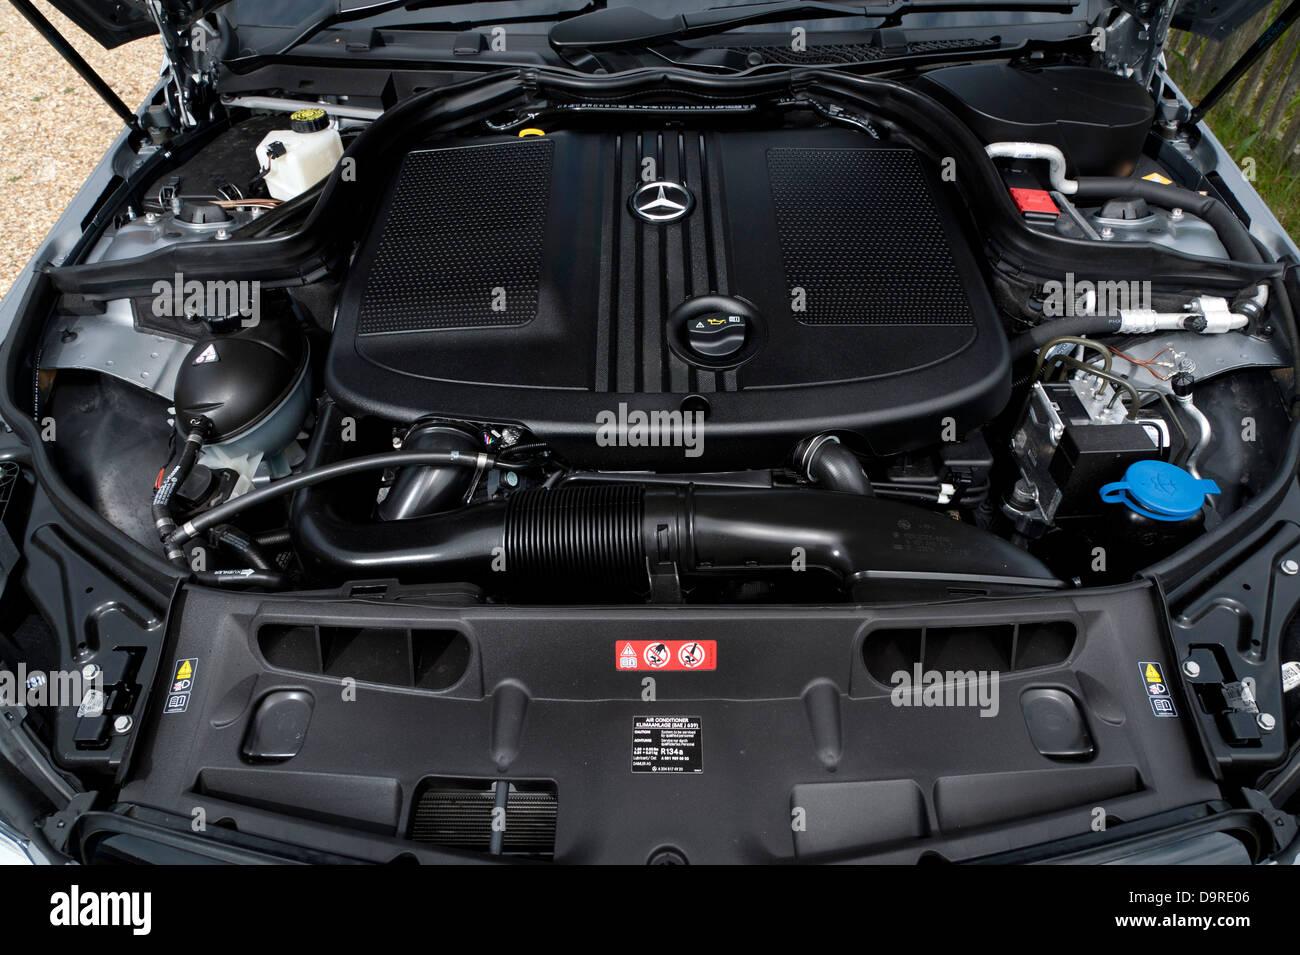 Mercedes Benz C250 AMG Sport engine 2013 - Stock Image